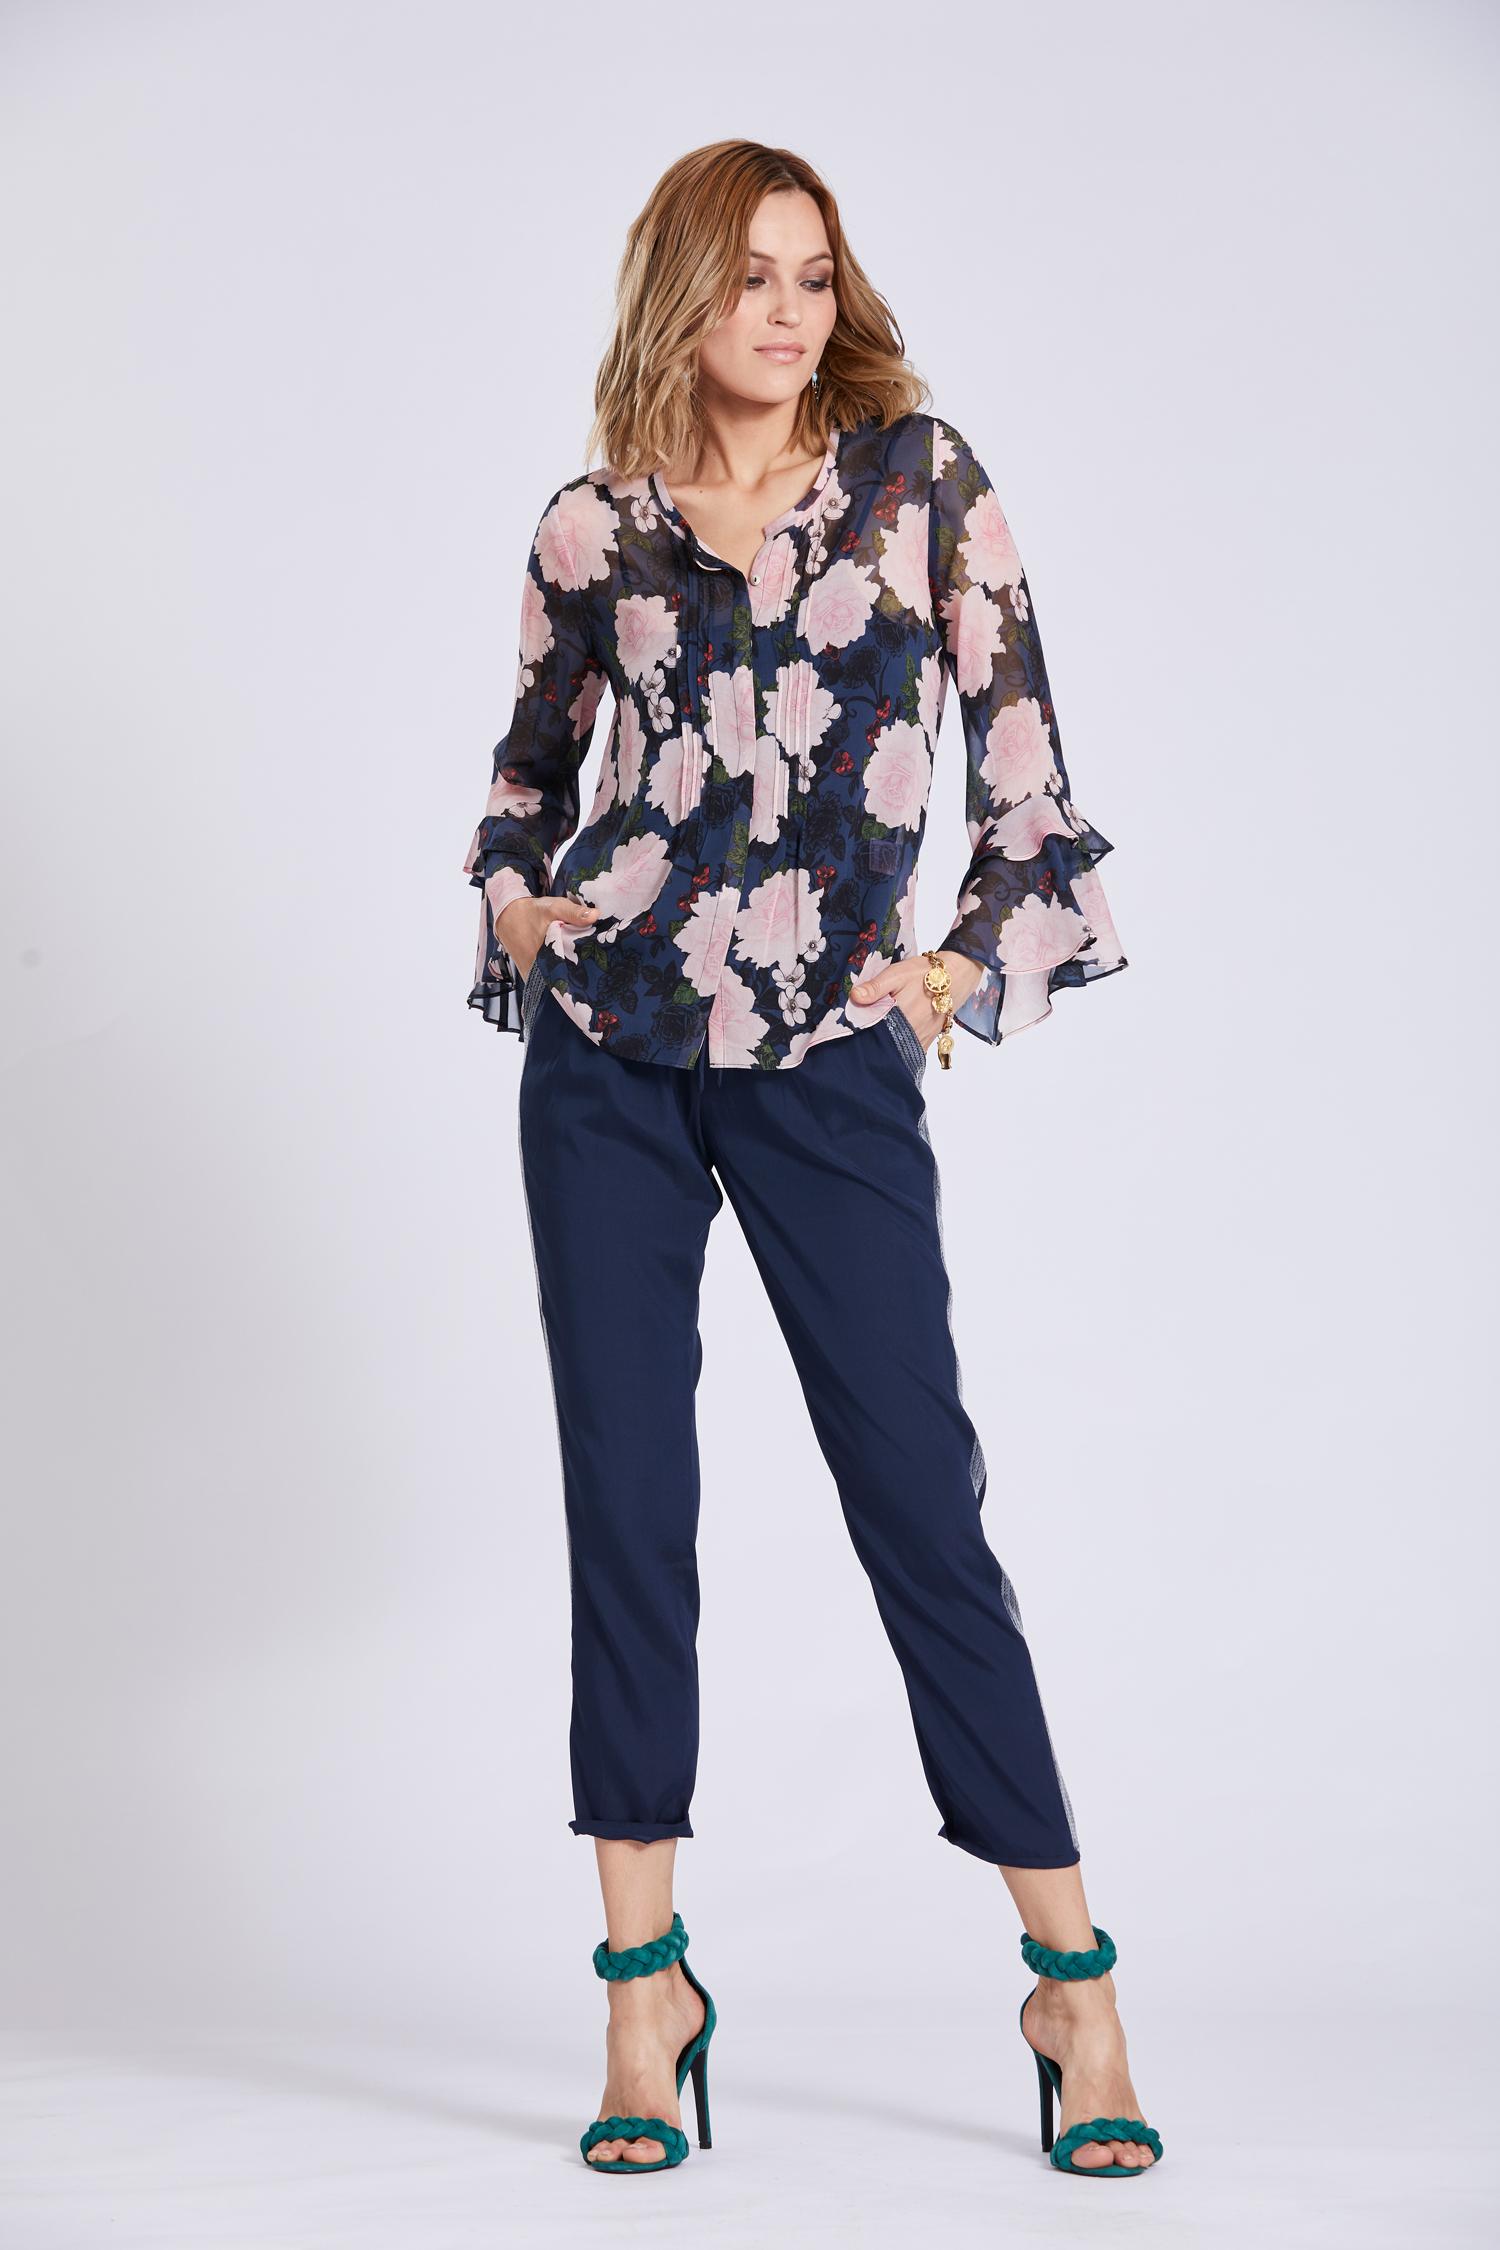 model wearing Loobie's Story Frill Seeker collection